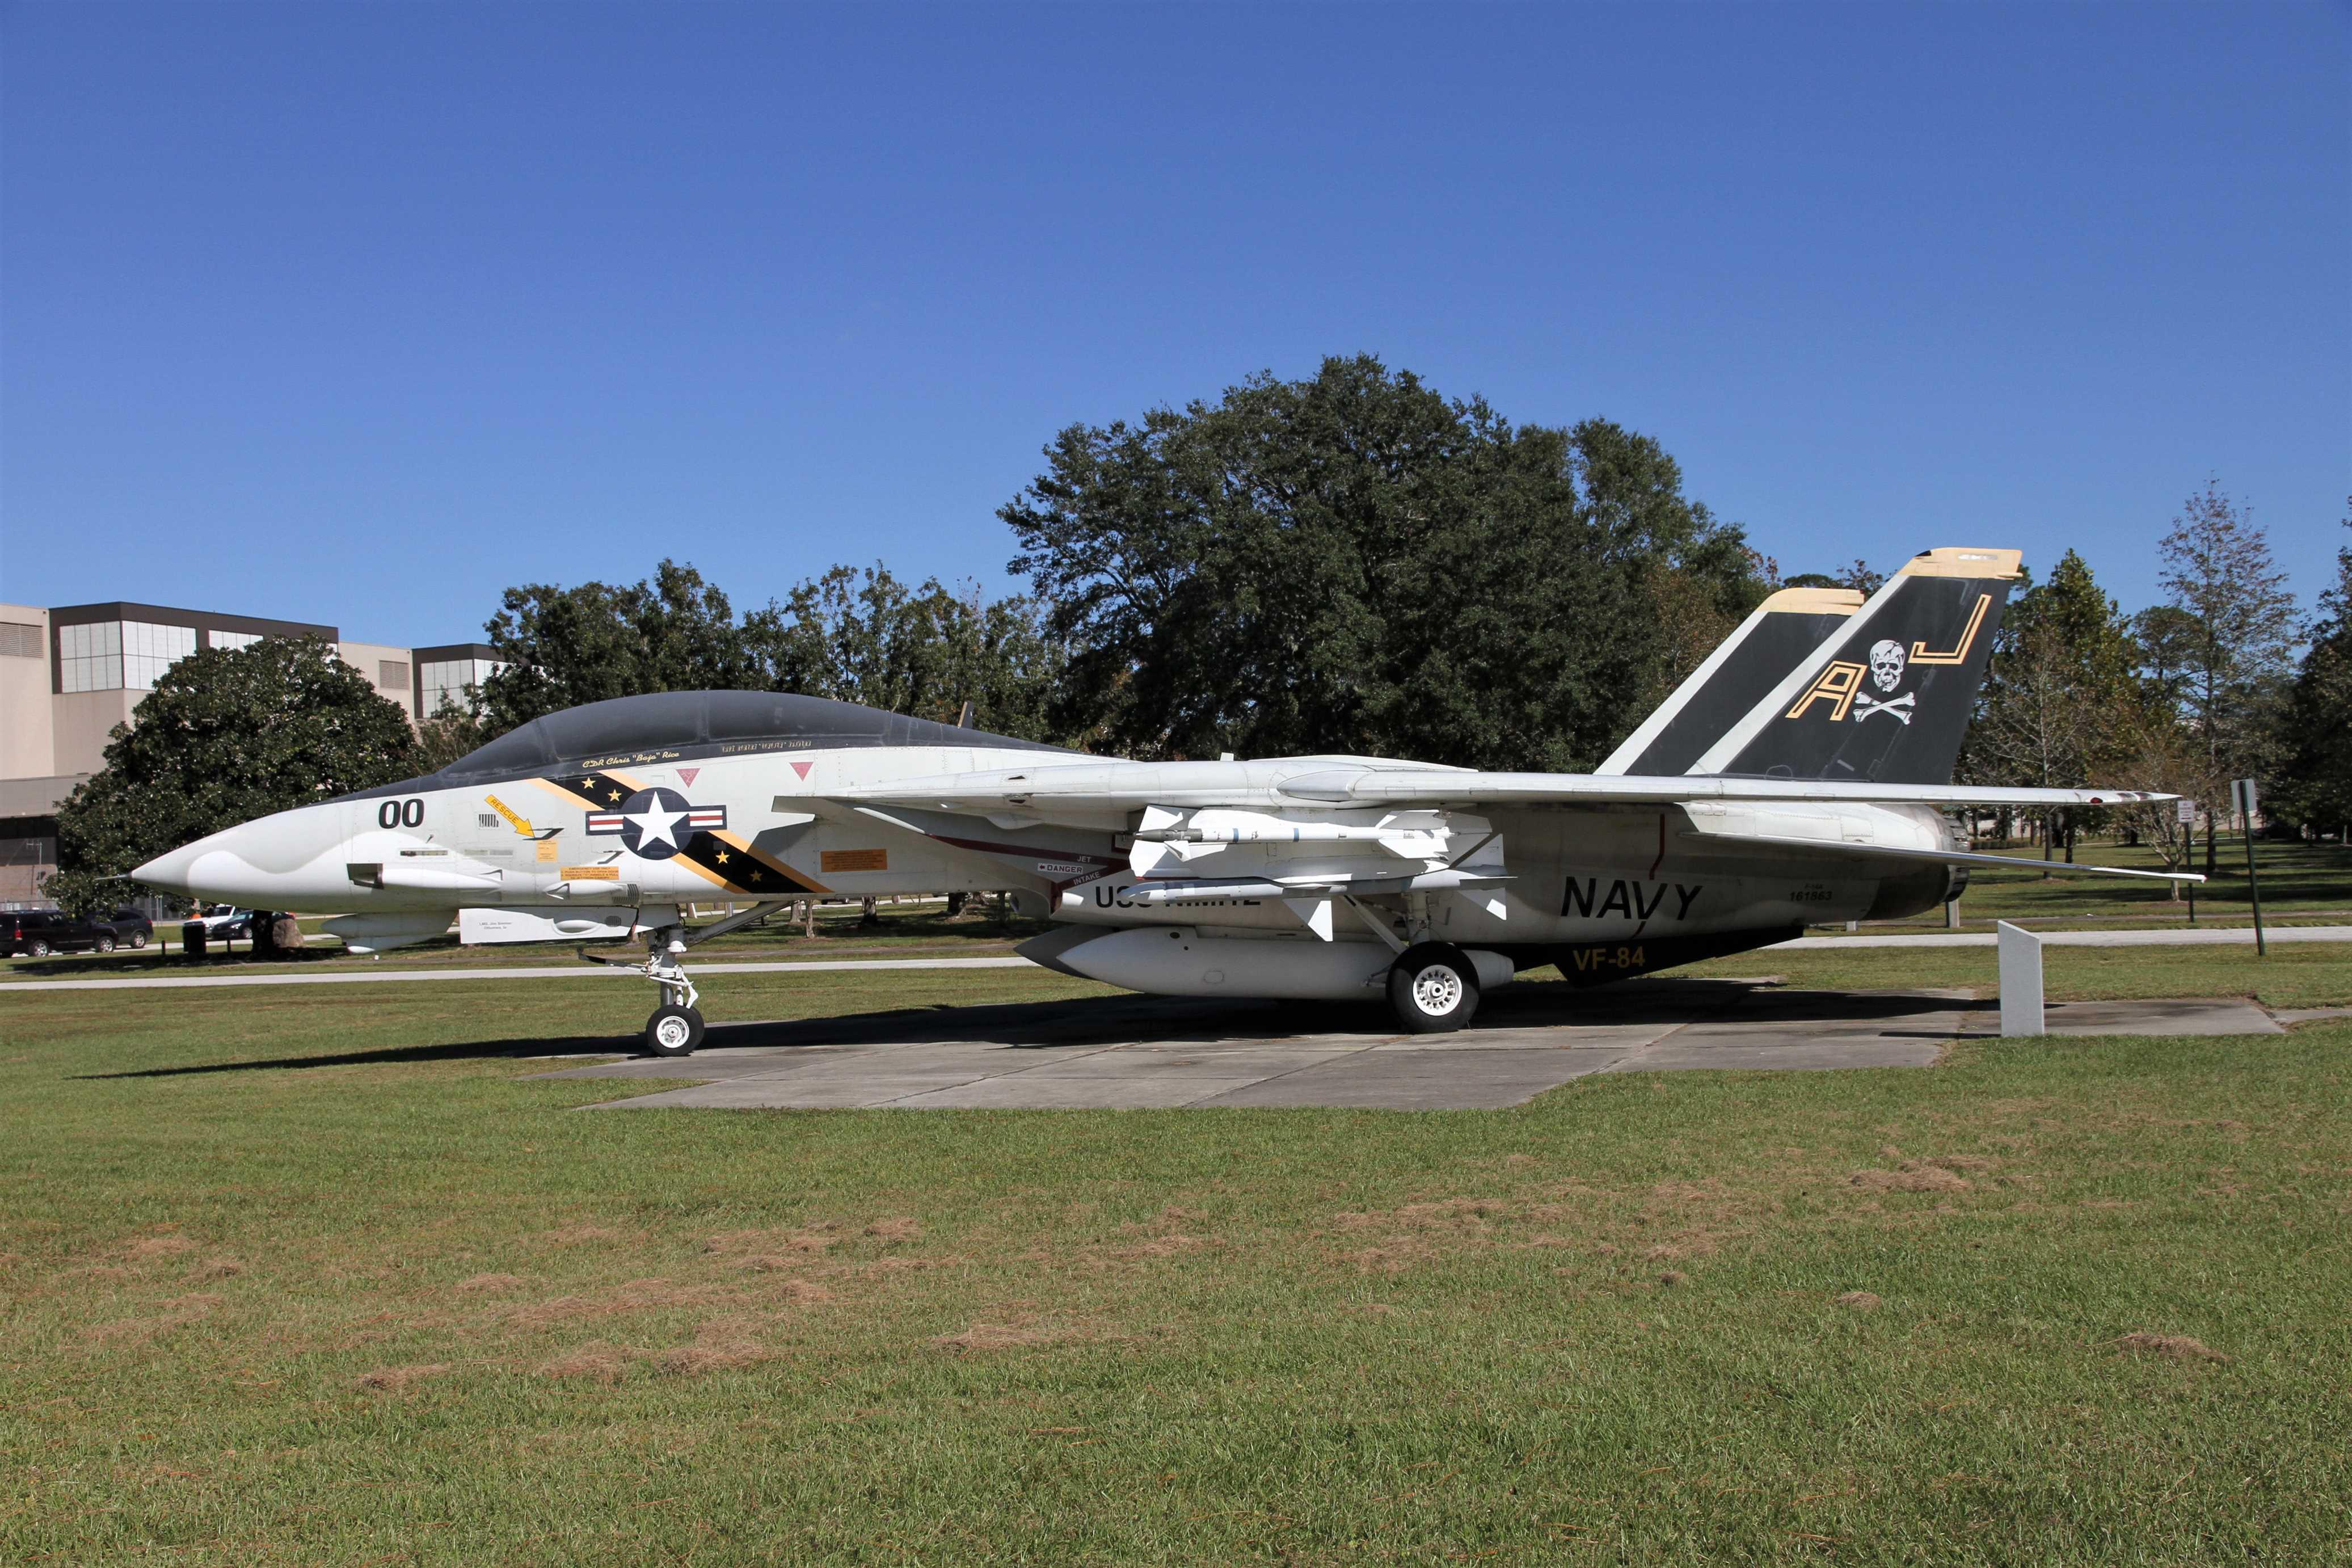 NAS Jacksonville (FL) Heritage Park